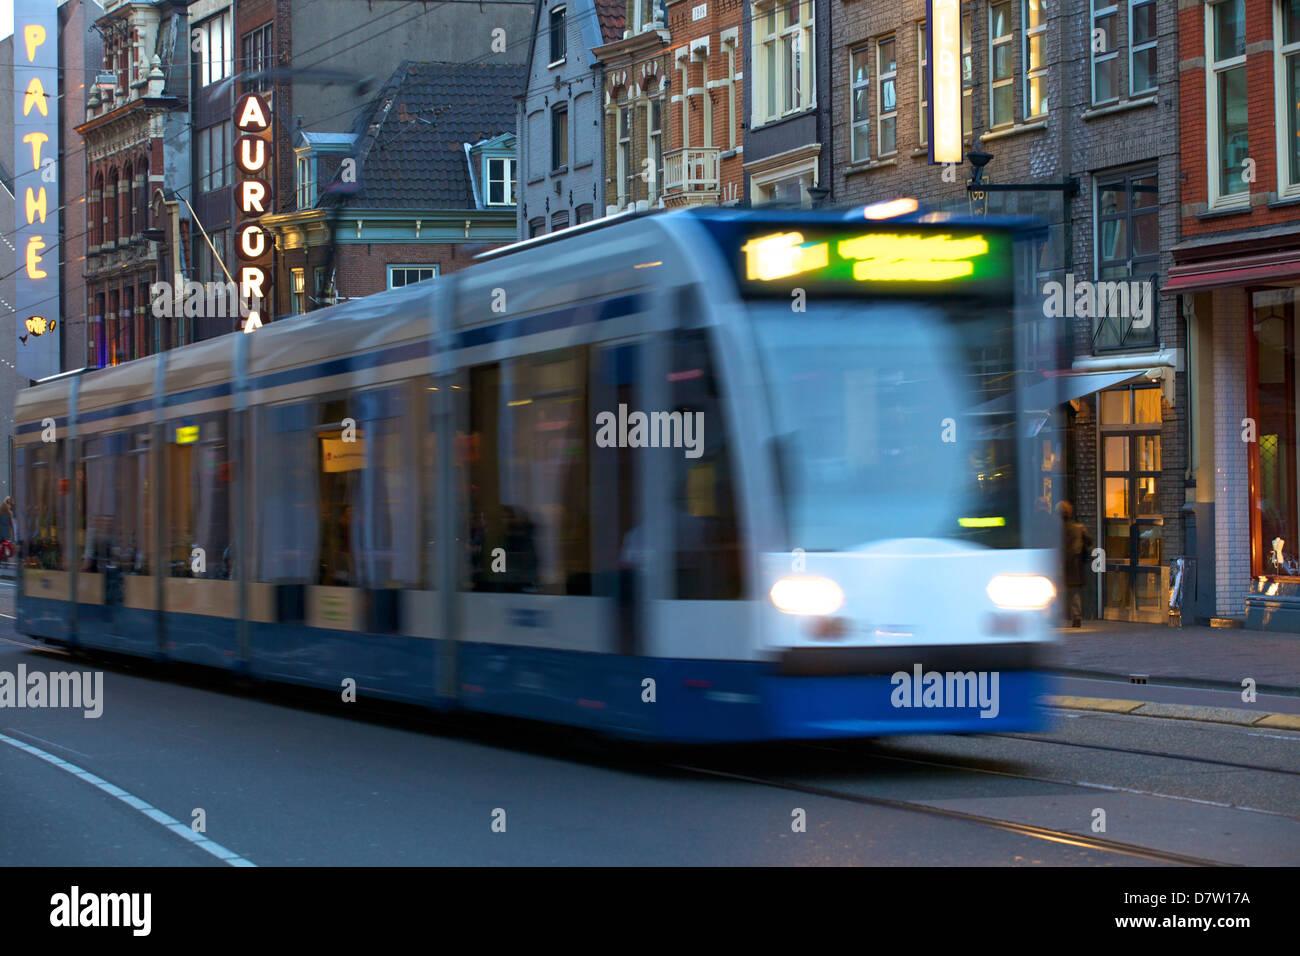 Tram, Amsterdam, Netherlands - Stock Image